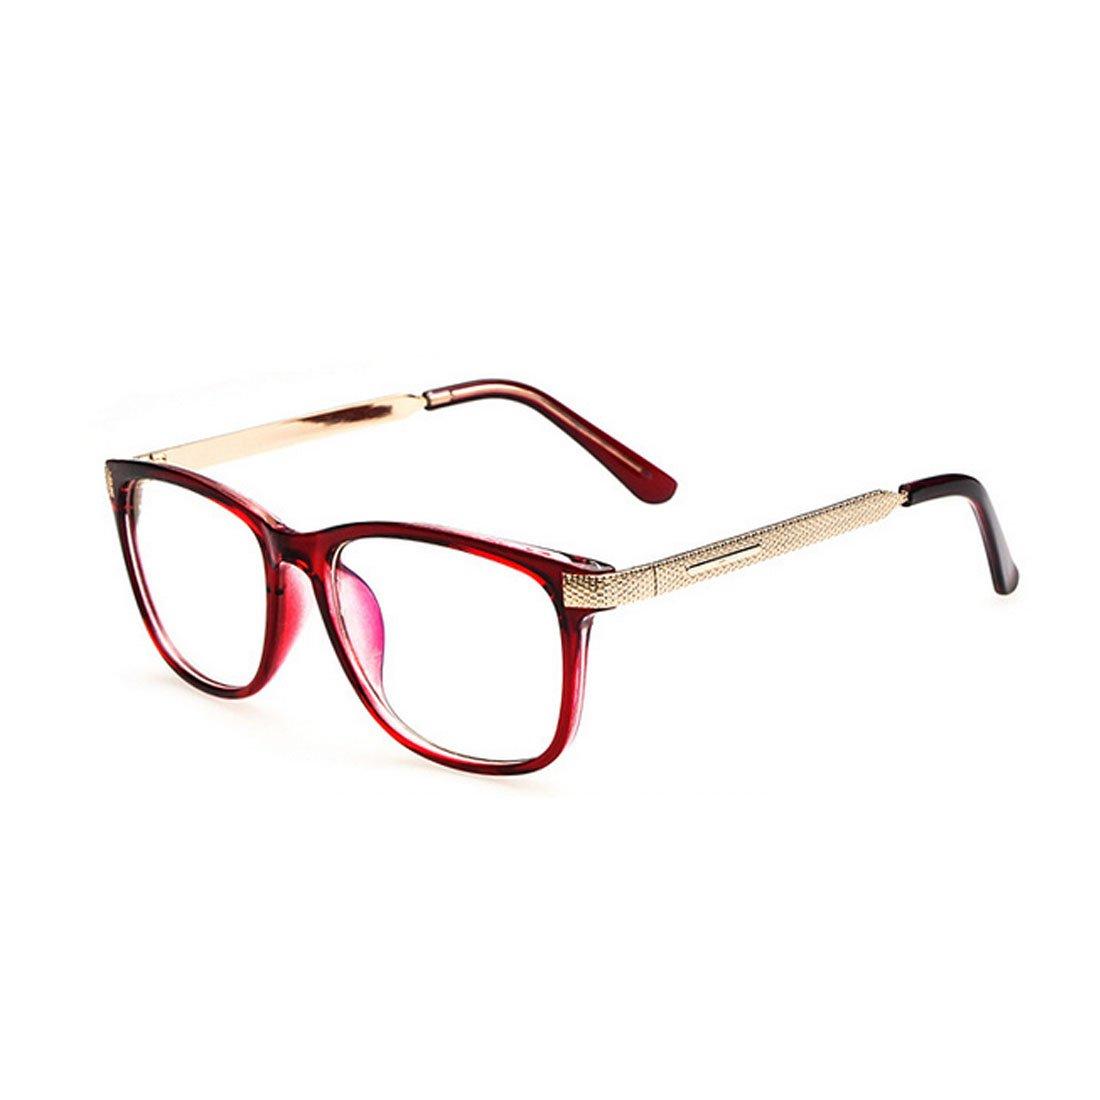 D.King Vintage Prescription Rectangular Eyeglasses Frame Clear Lens Glasses DK6102173-1